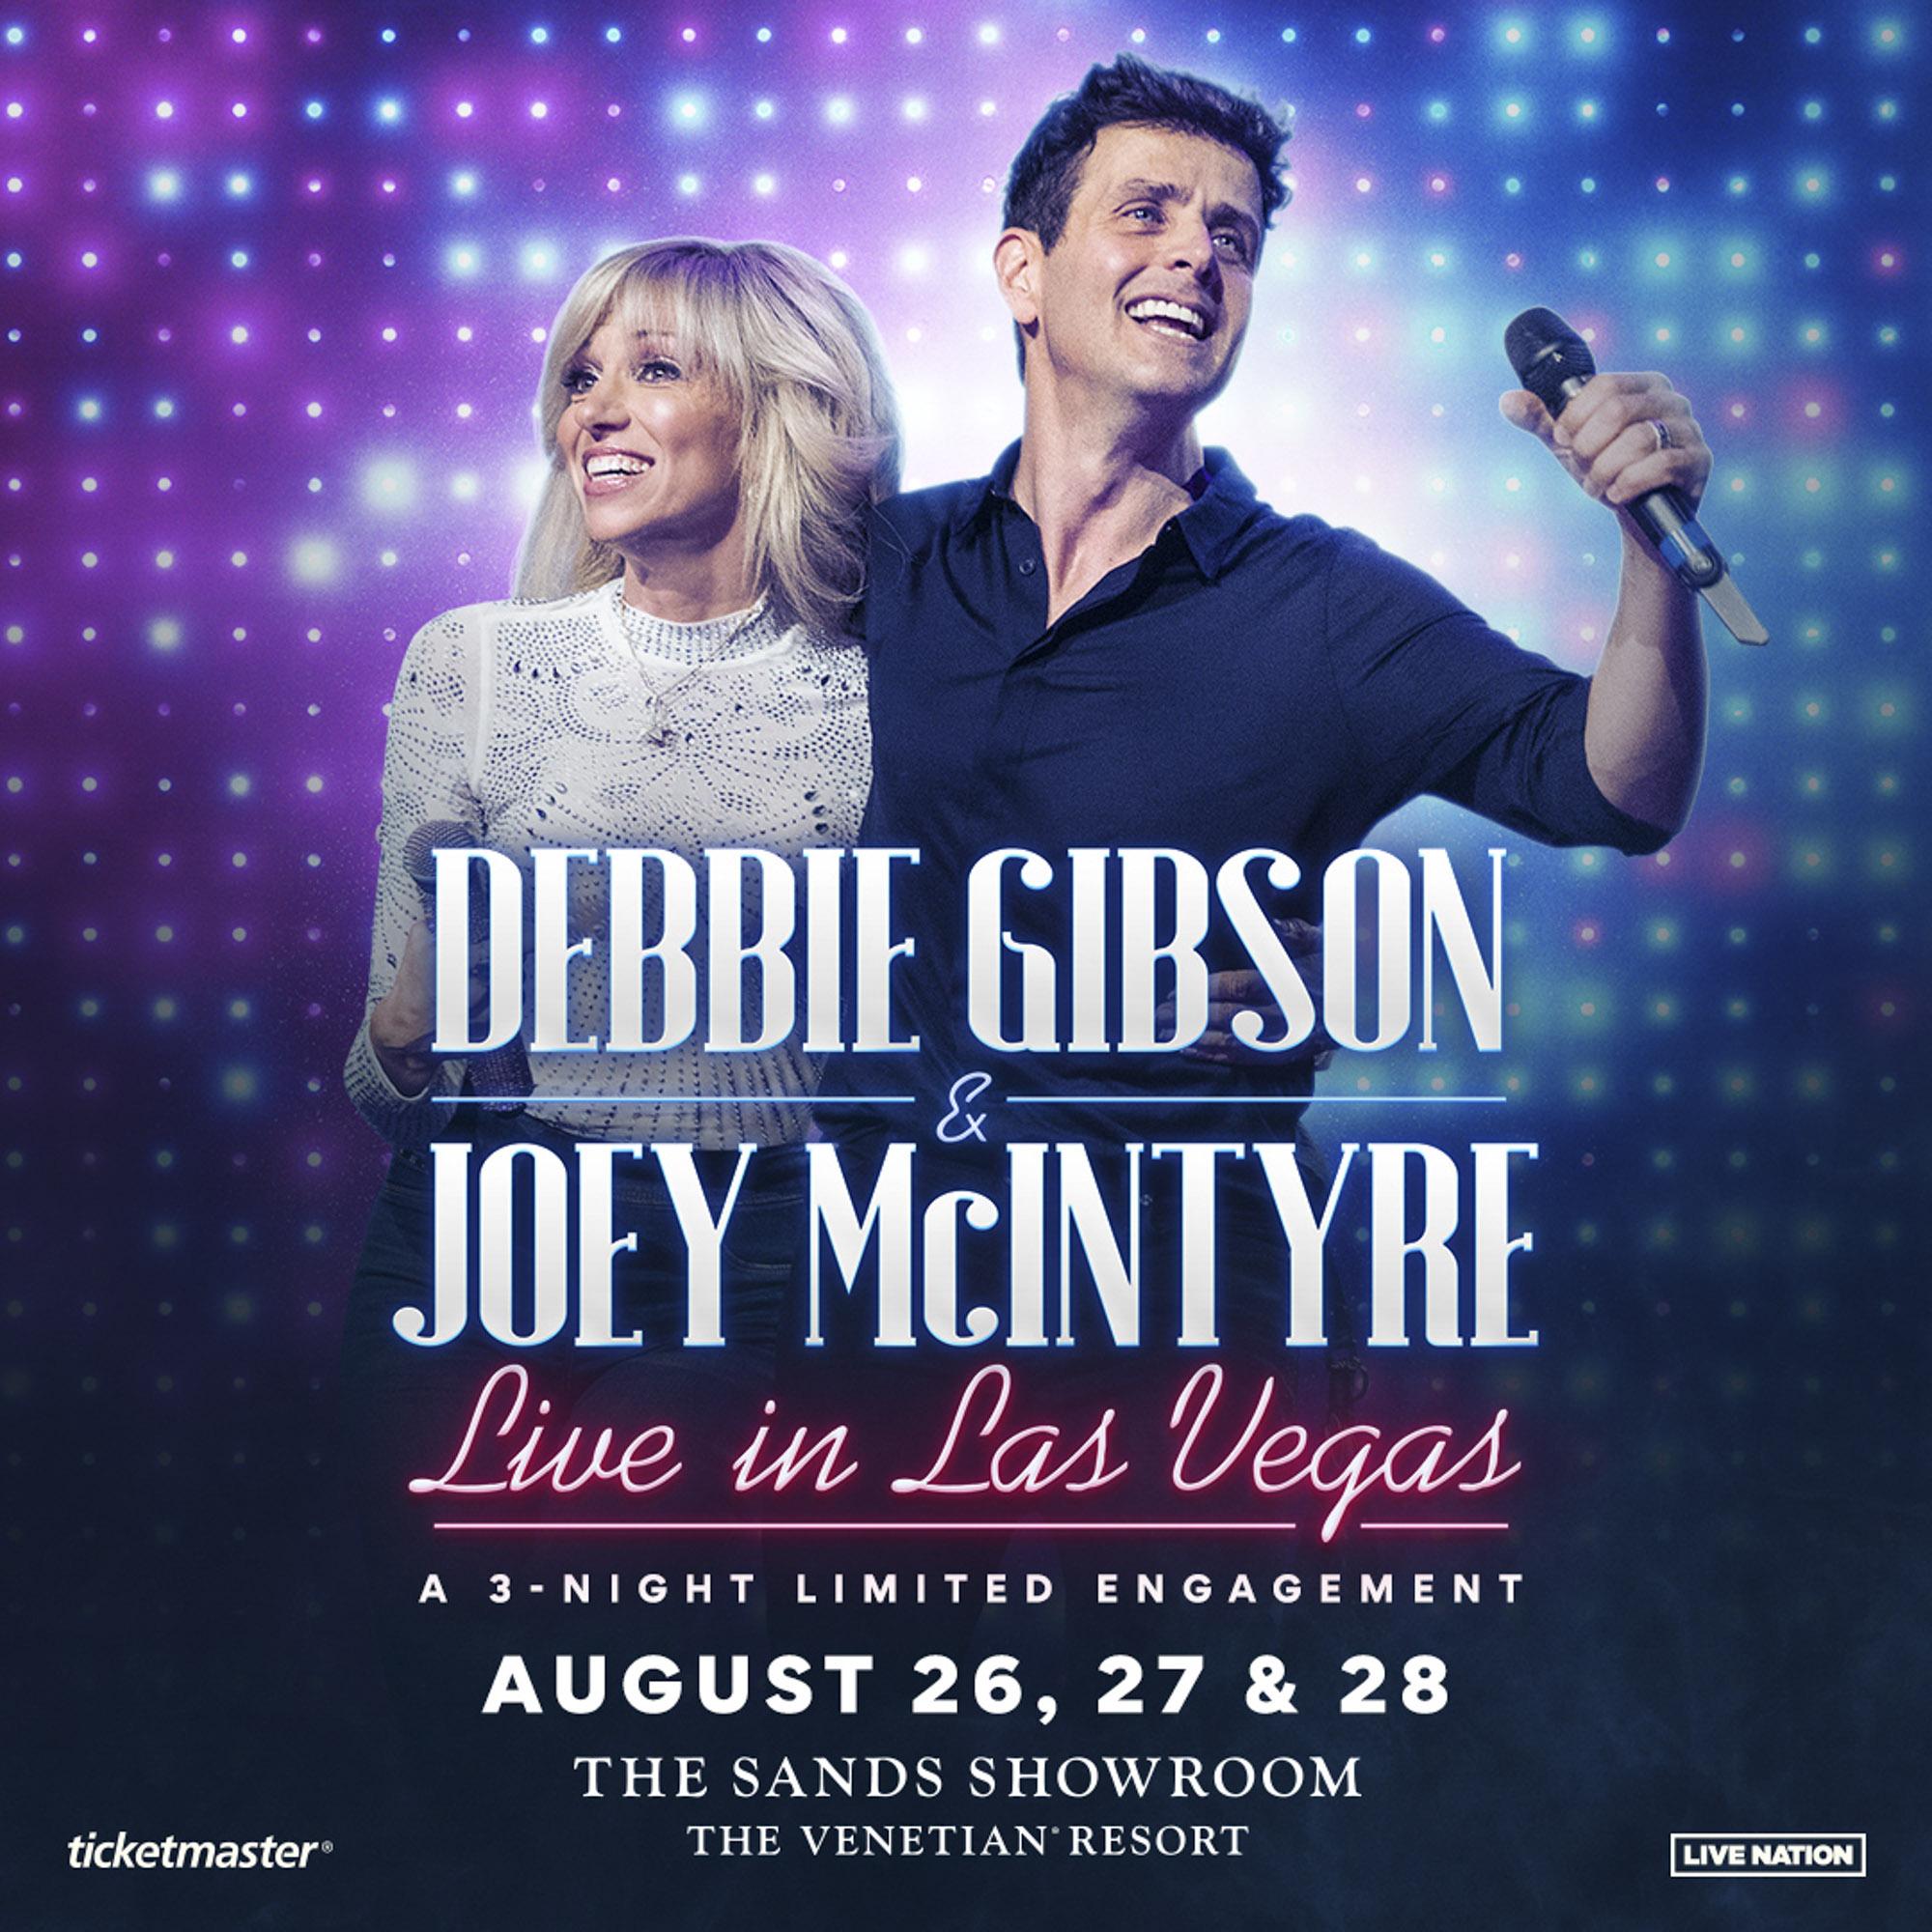 Debbie Gibson and Joey McIntyre